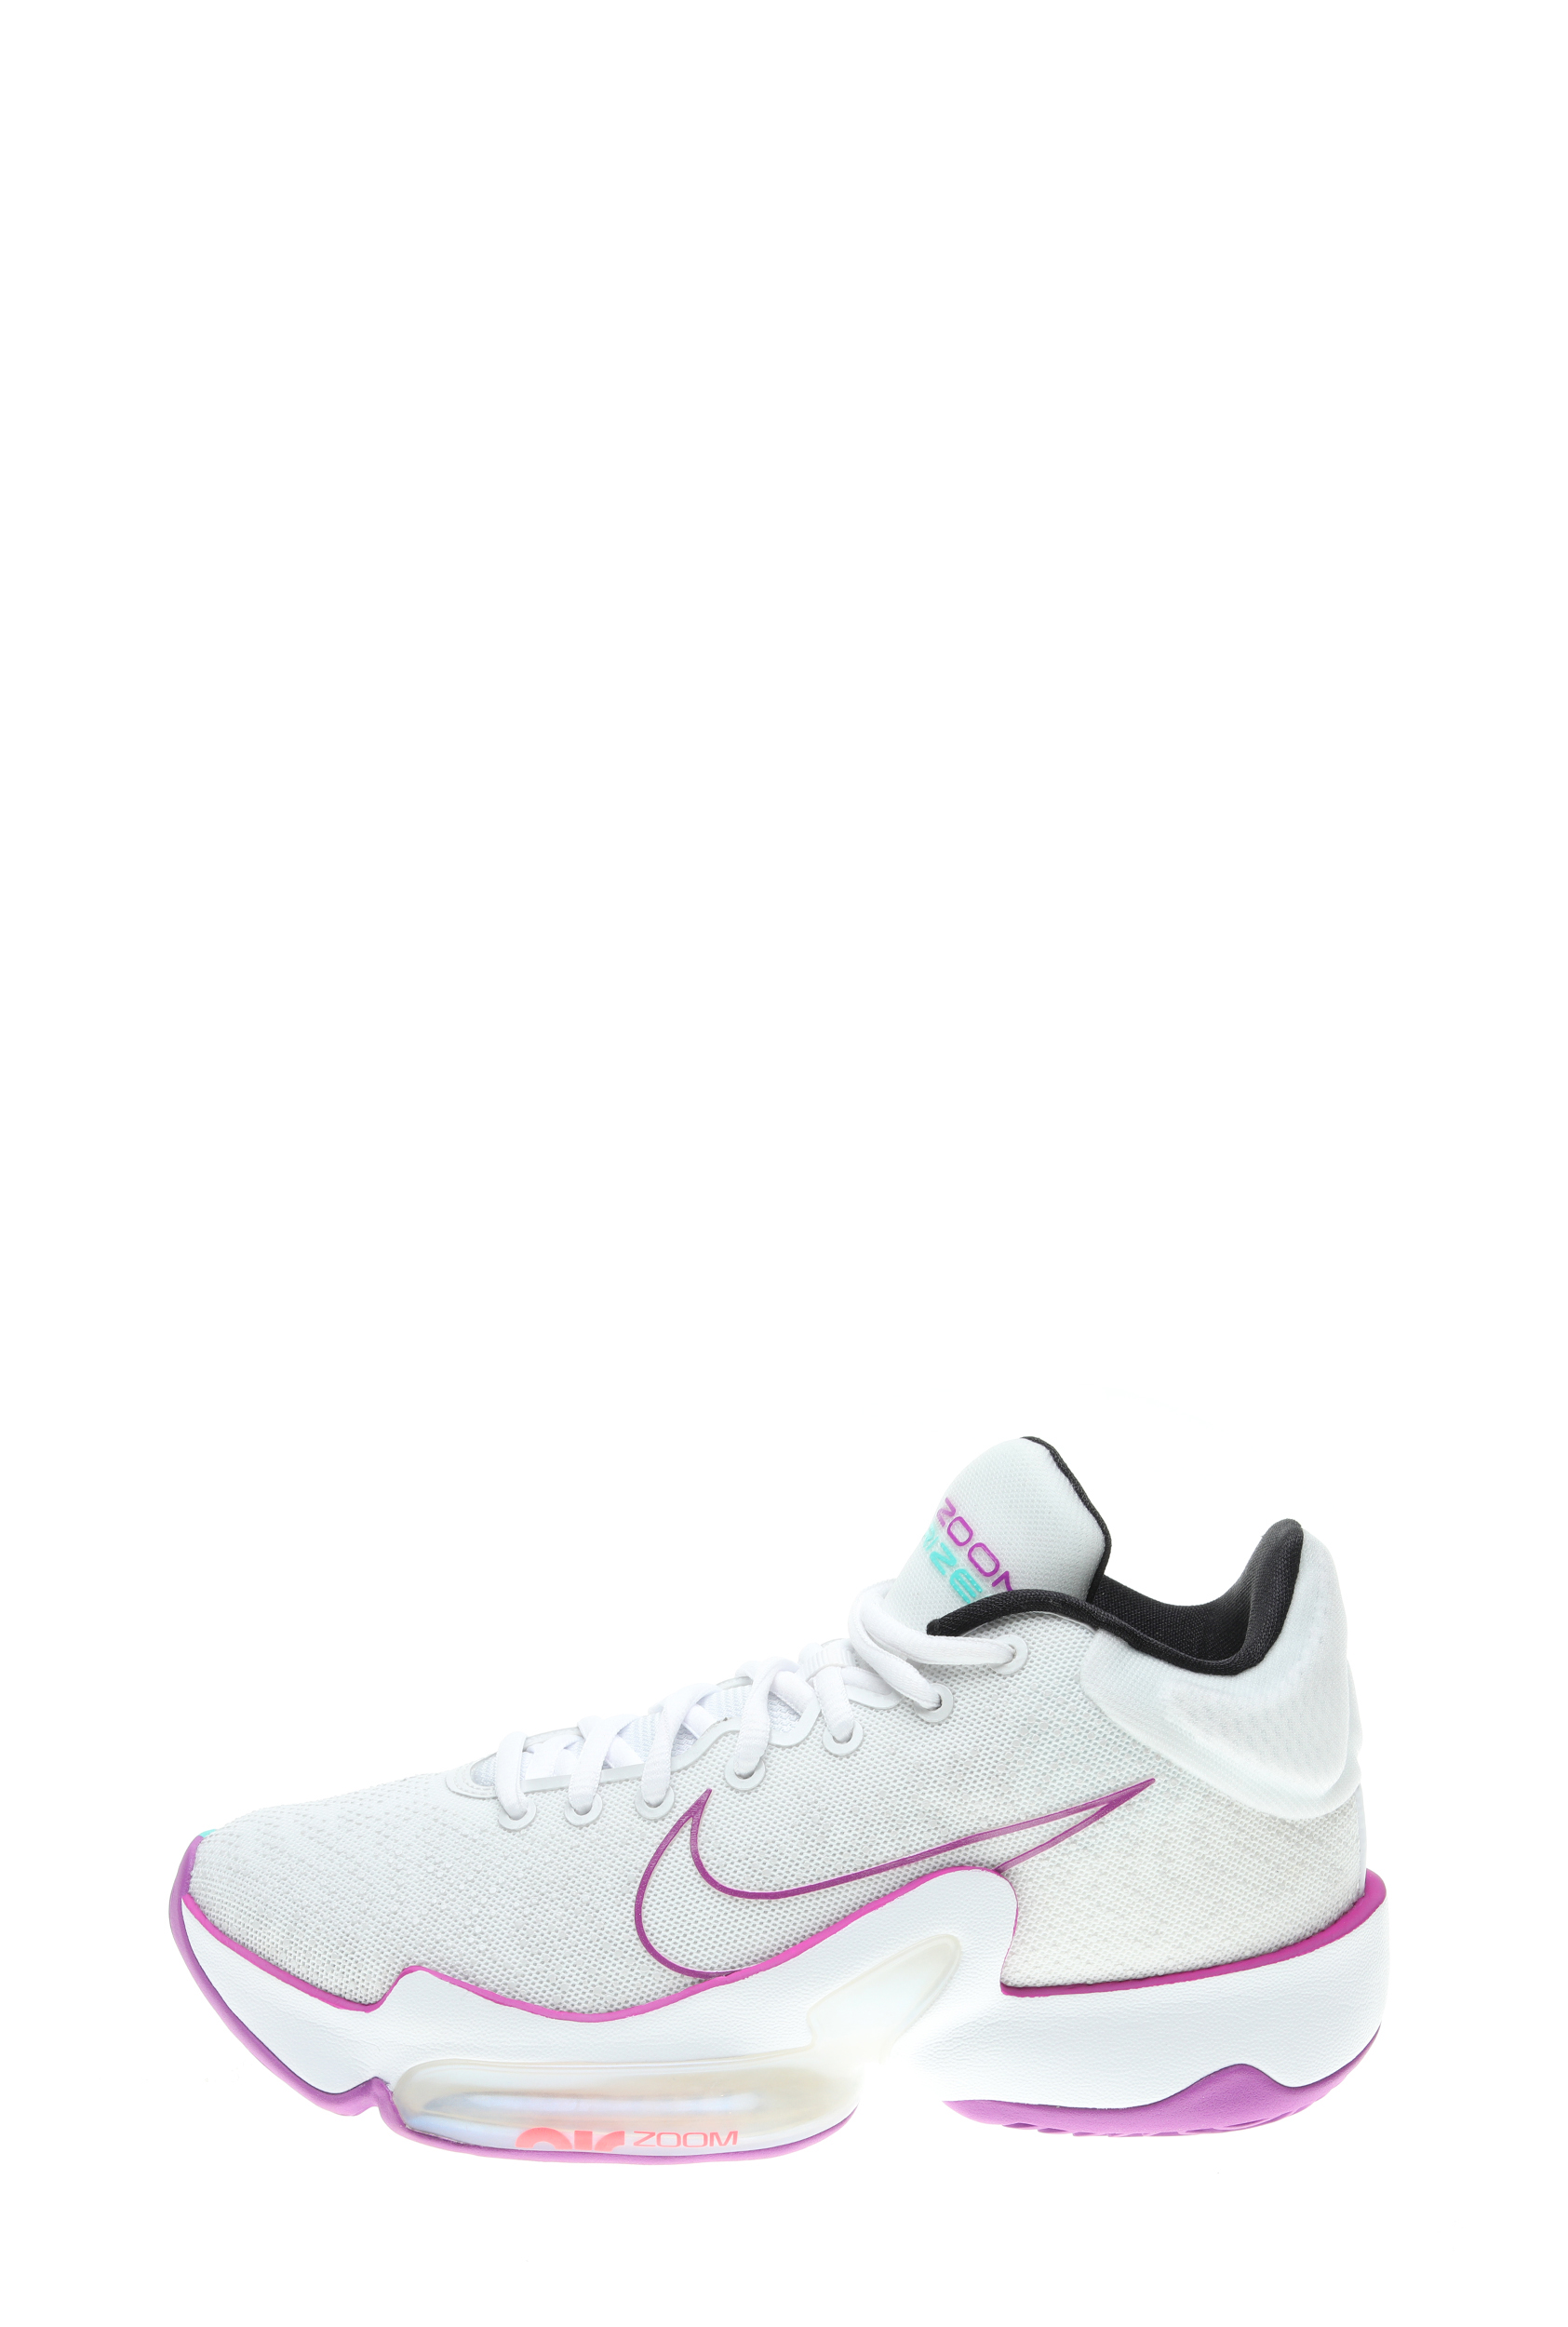 NIKE – Unisex παπούτσια μπάσκετ NIKE ZOOM RIZE 2 λευκό-μοβ